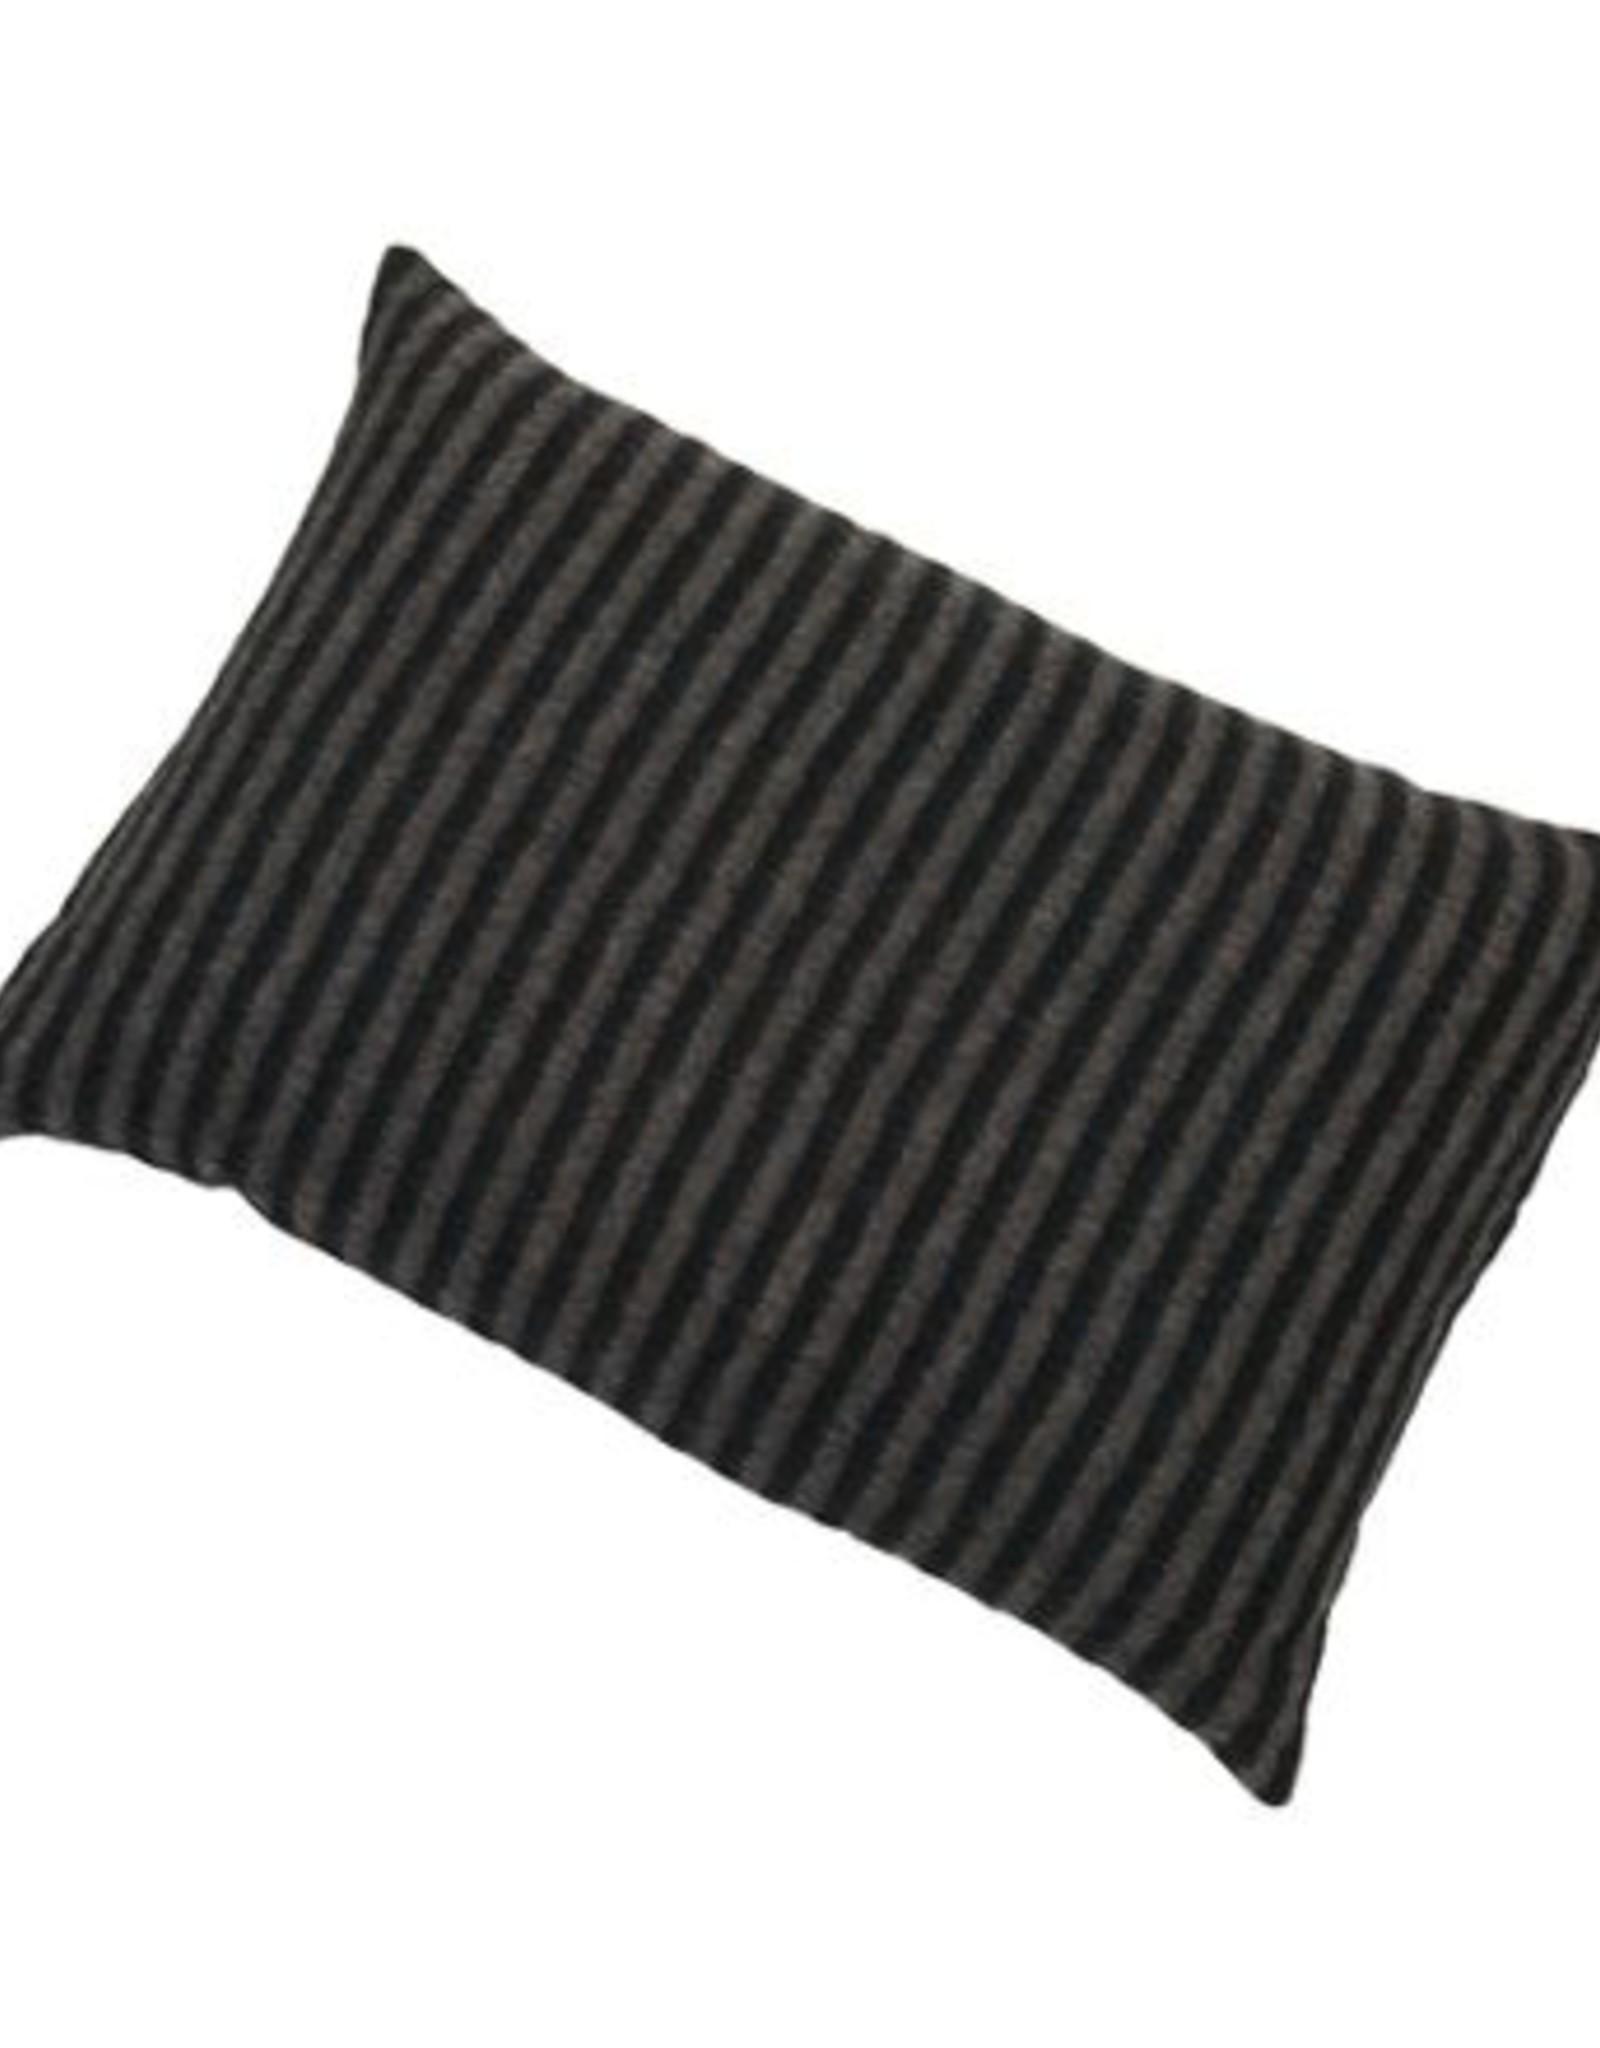 Elvang Underscore Beige cushion